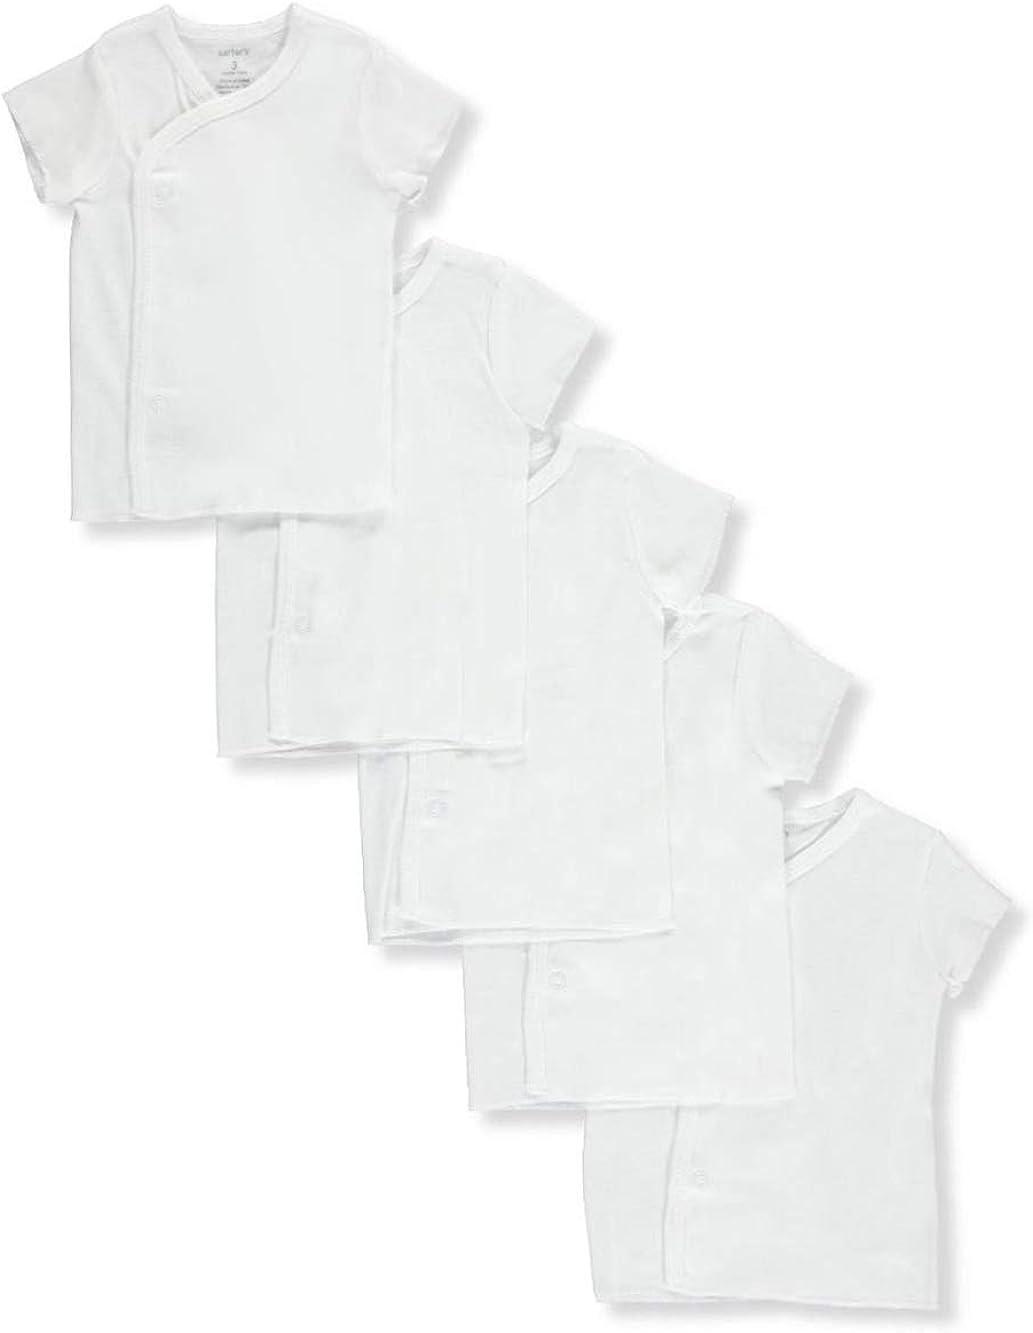 Carter's Unisex Baby 5-Pack Shirts - White, premie